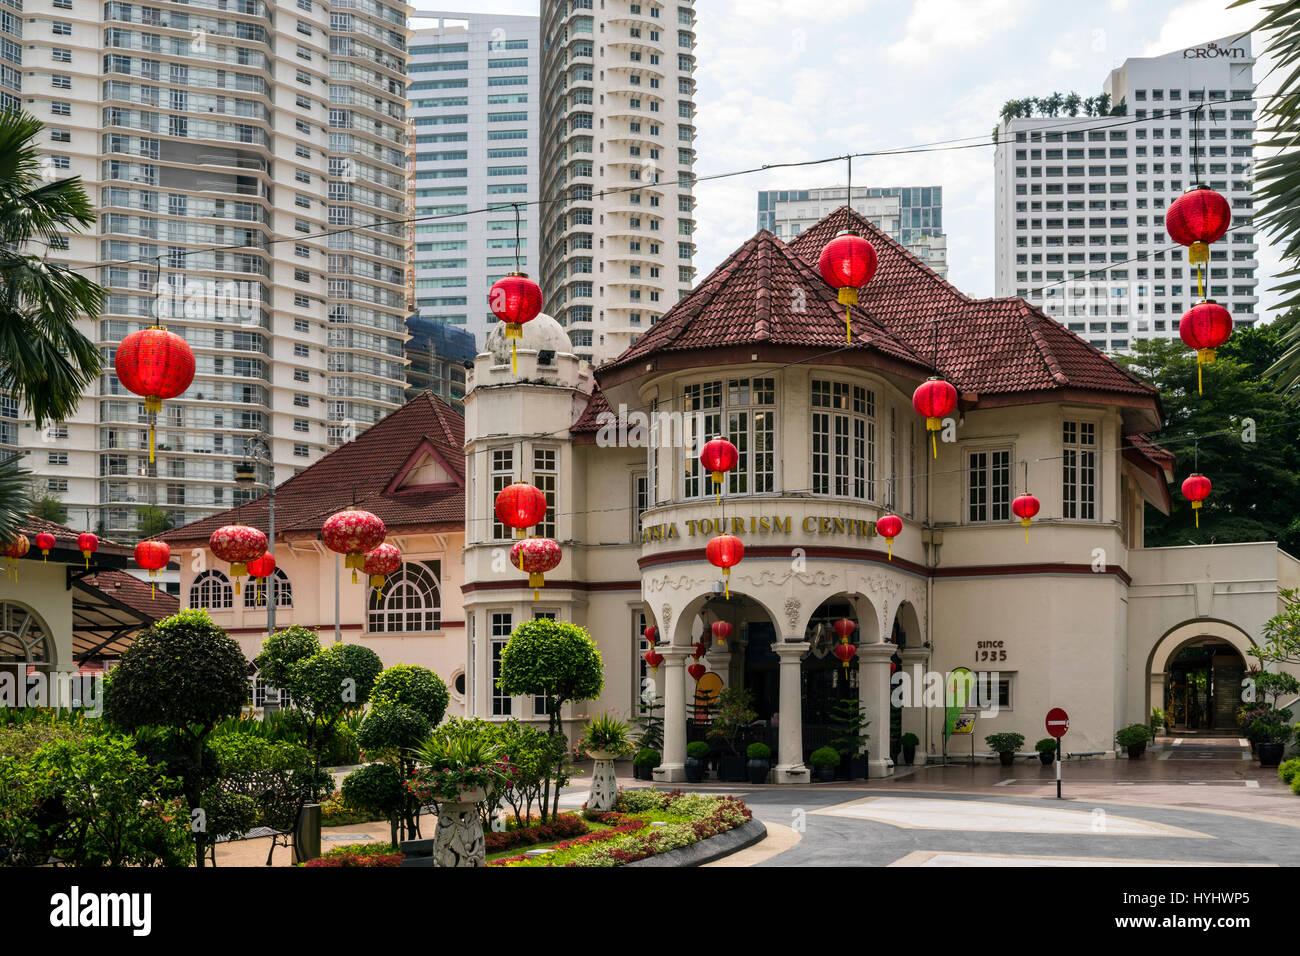 Malaysia Tourism Centre, Kuala Lumpur, Malesia Immagini Stock